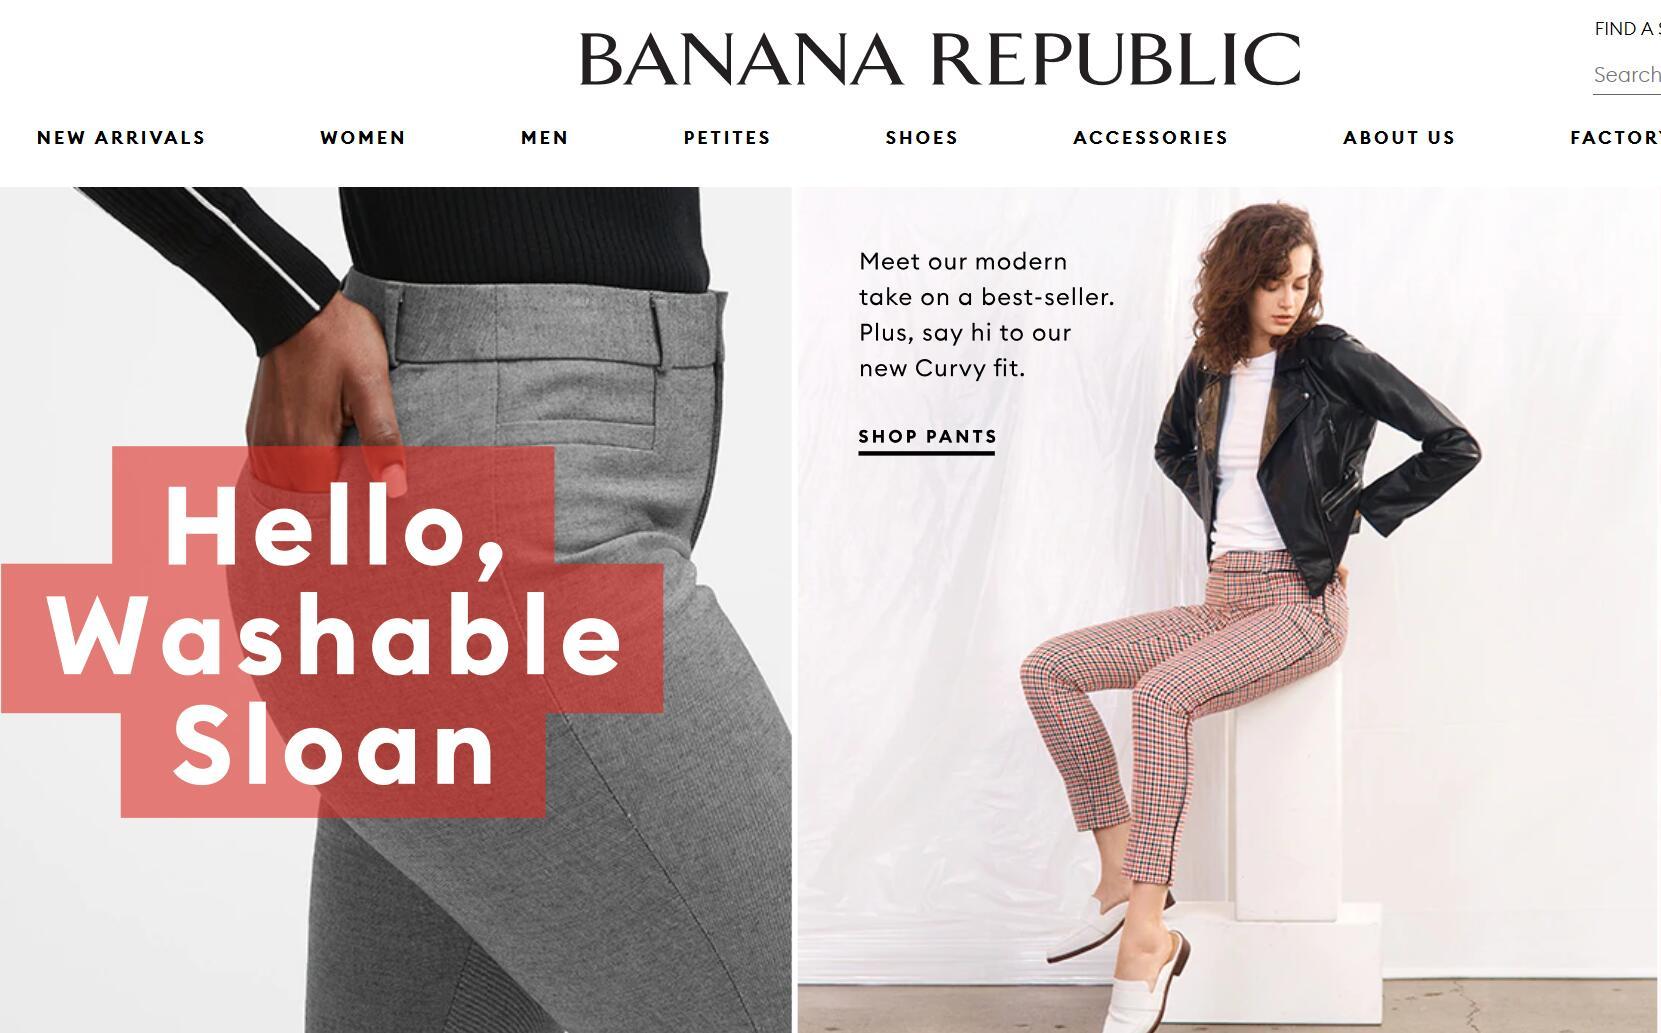 Gap 集团旗下品牌 Banana Republic 推出按月租衣服务